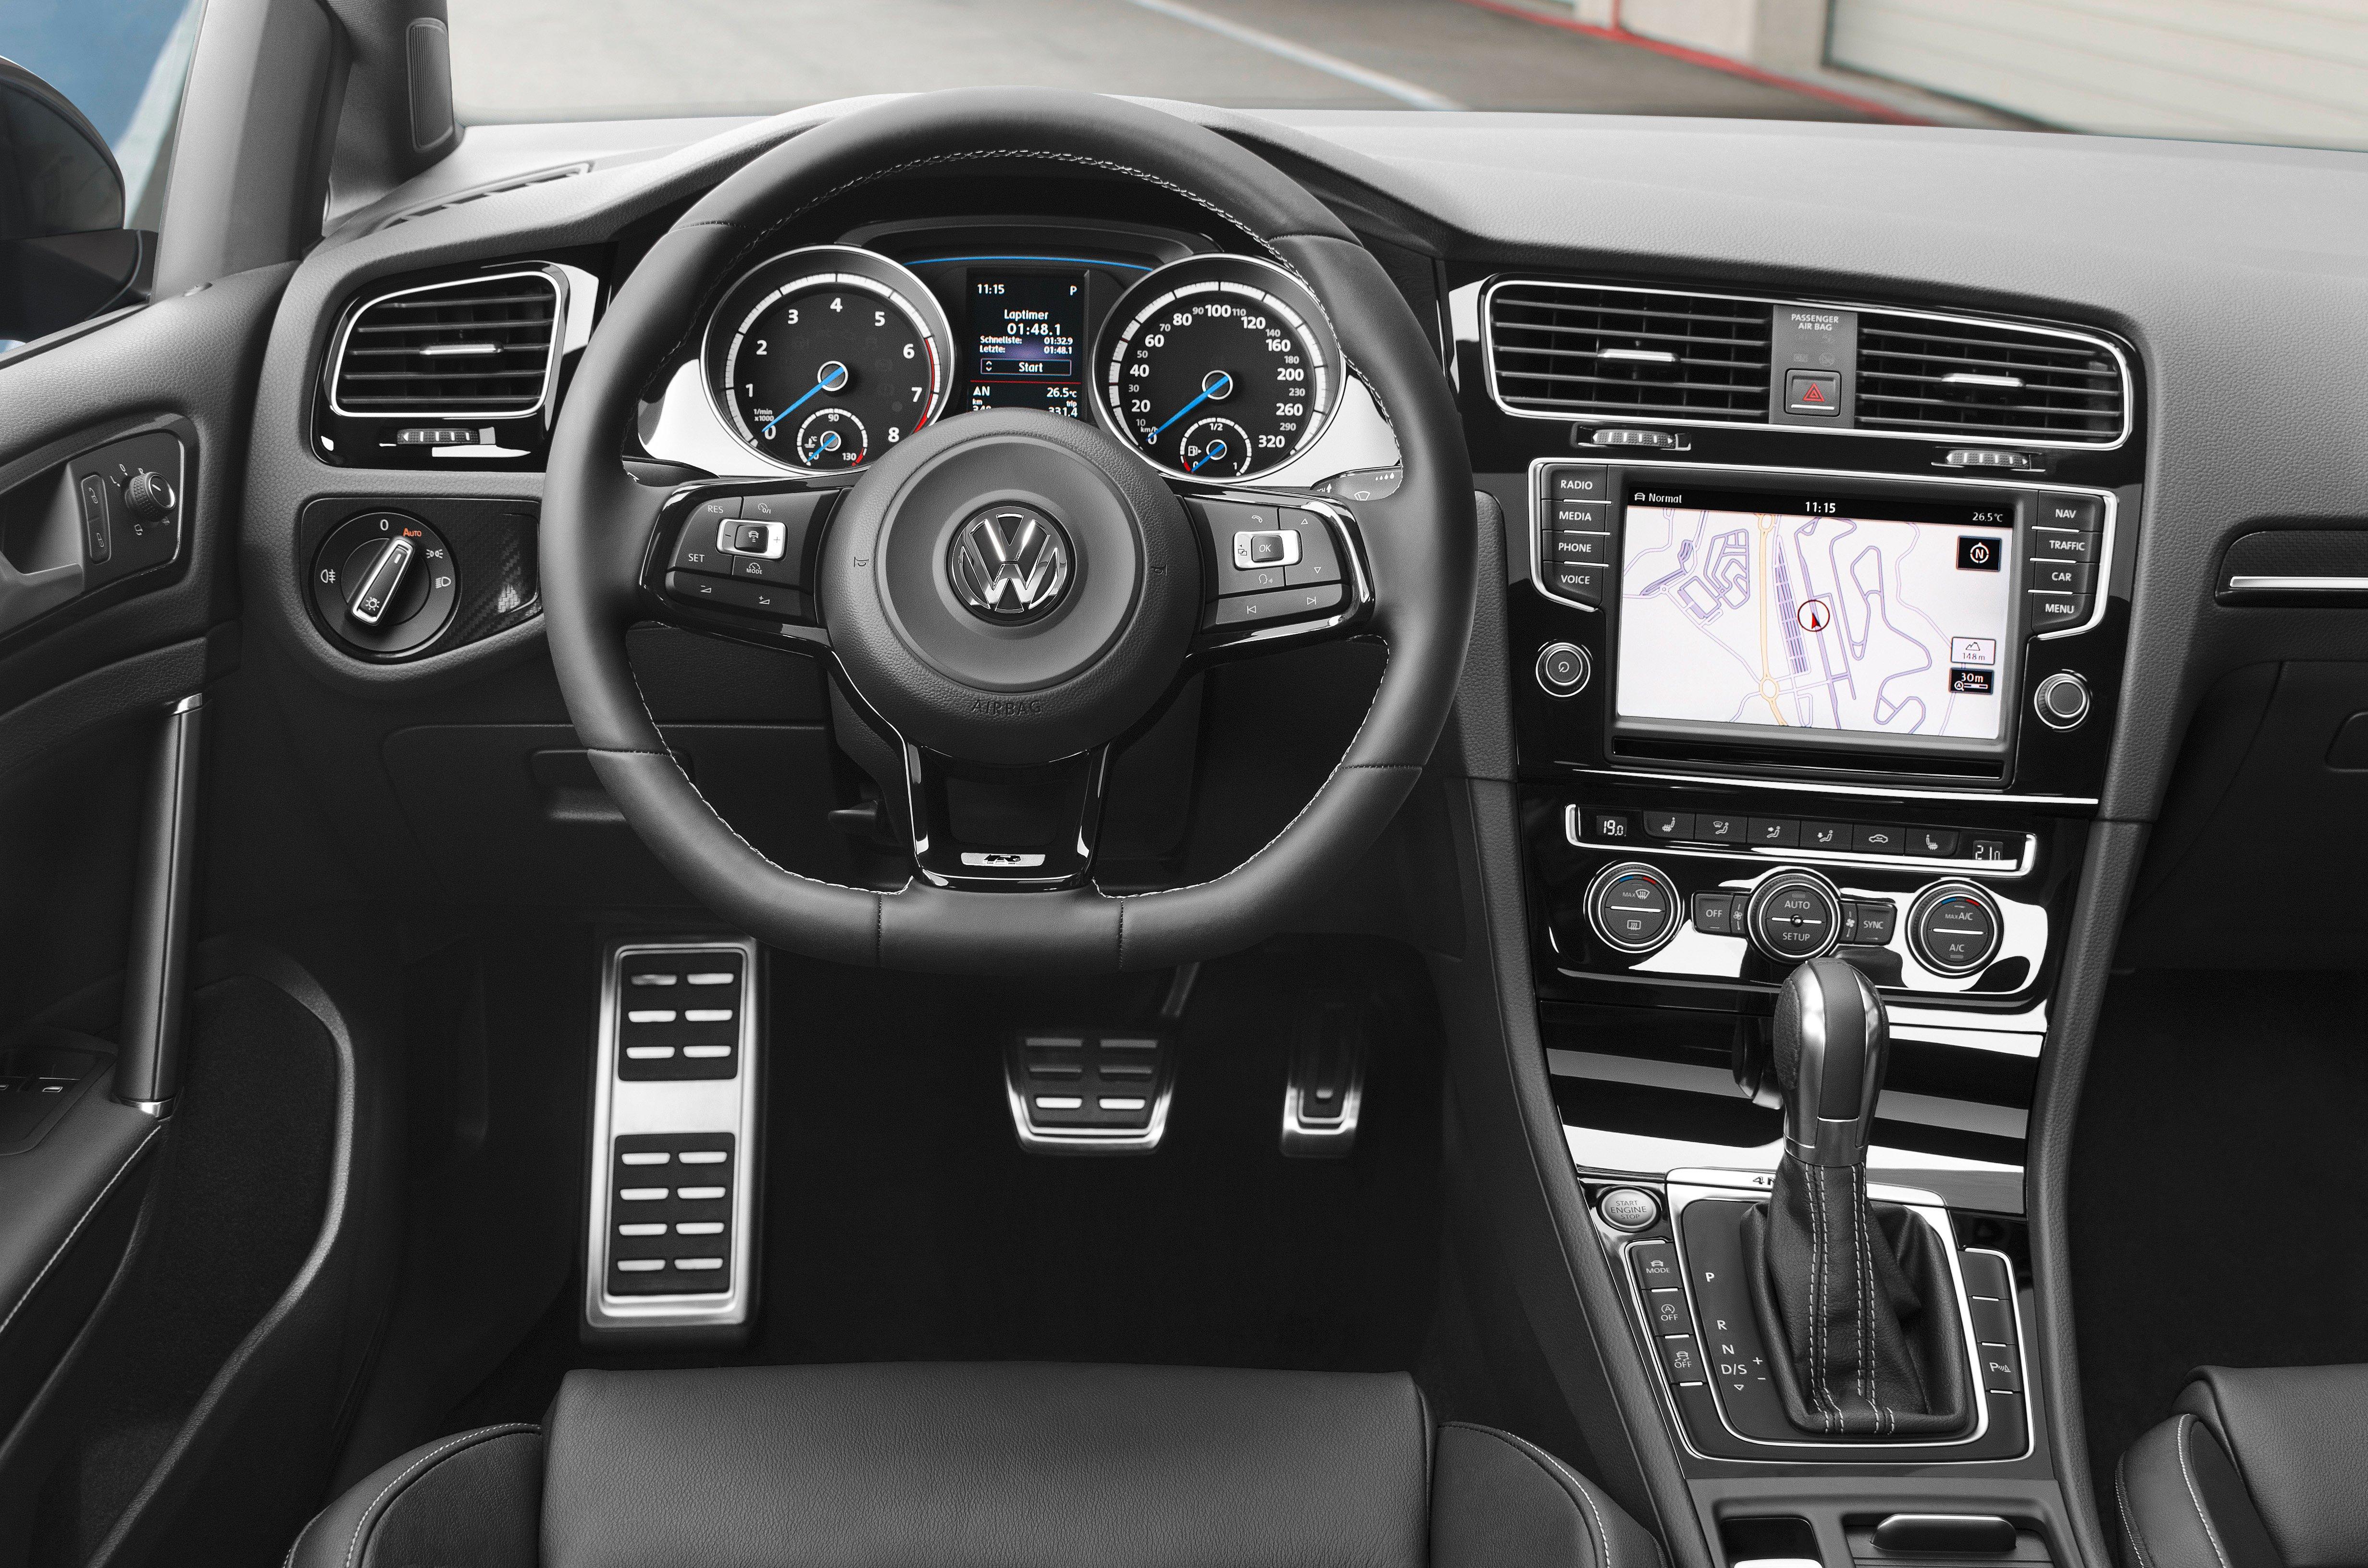 Volkswagen Golf R Mk7 First Details 300 Ps Awd Image 221273